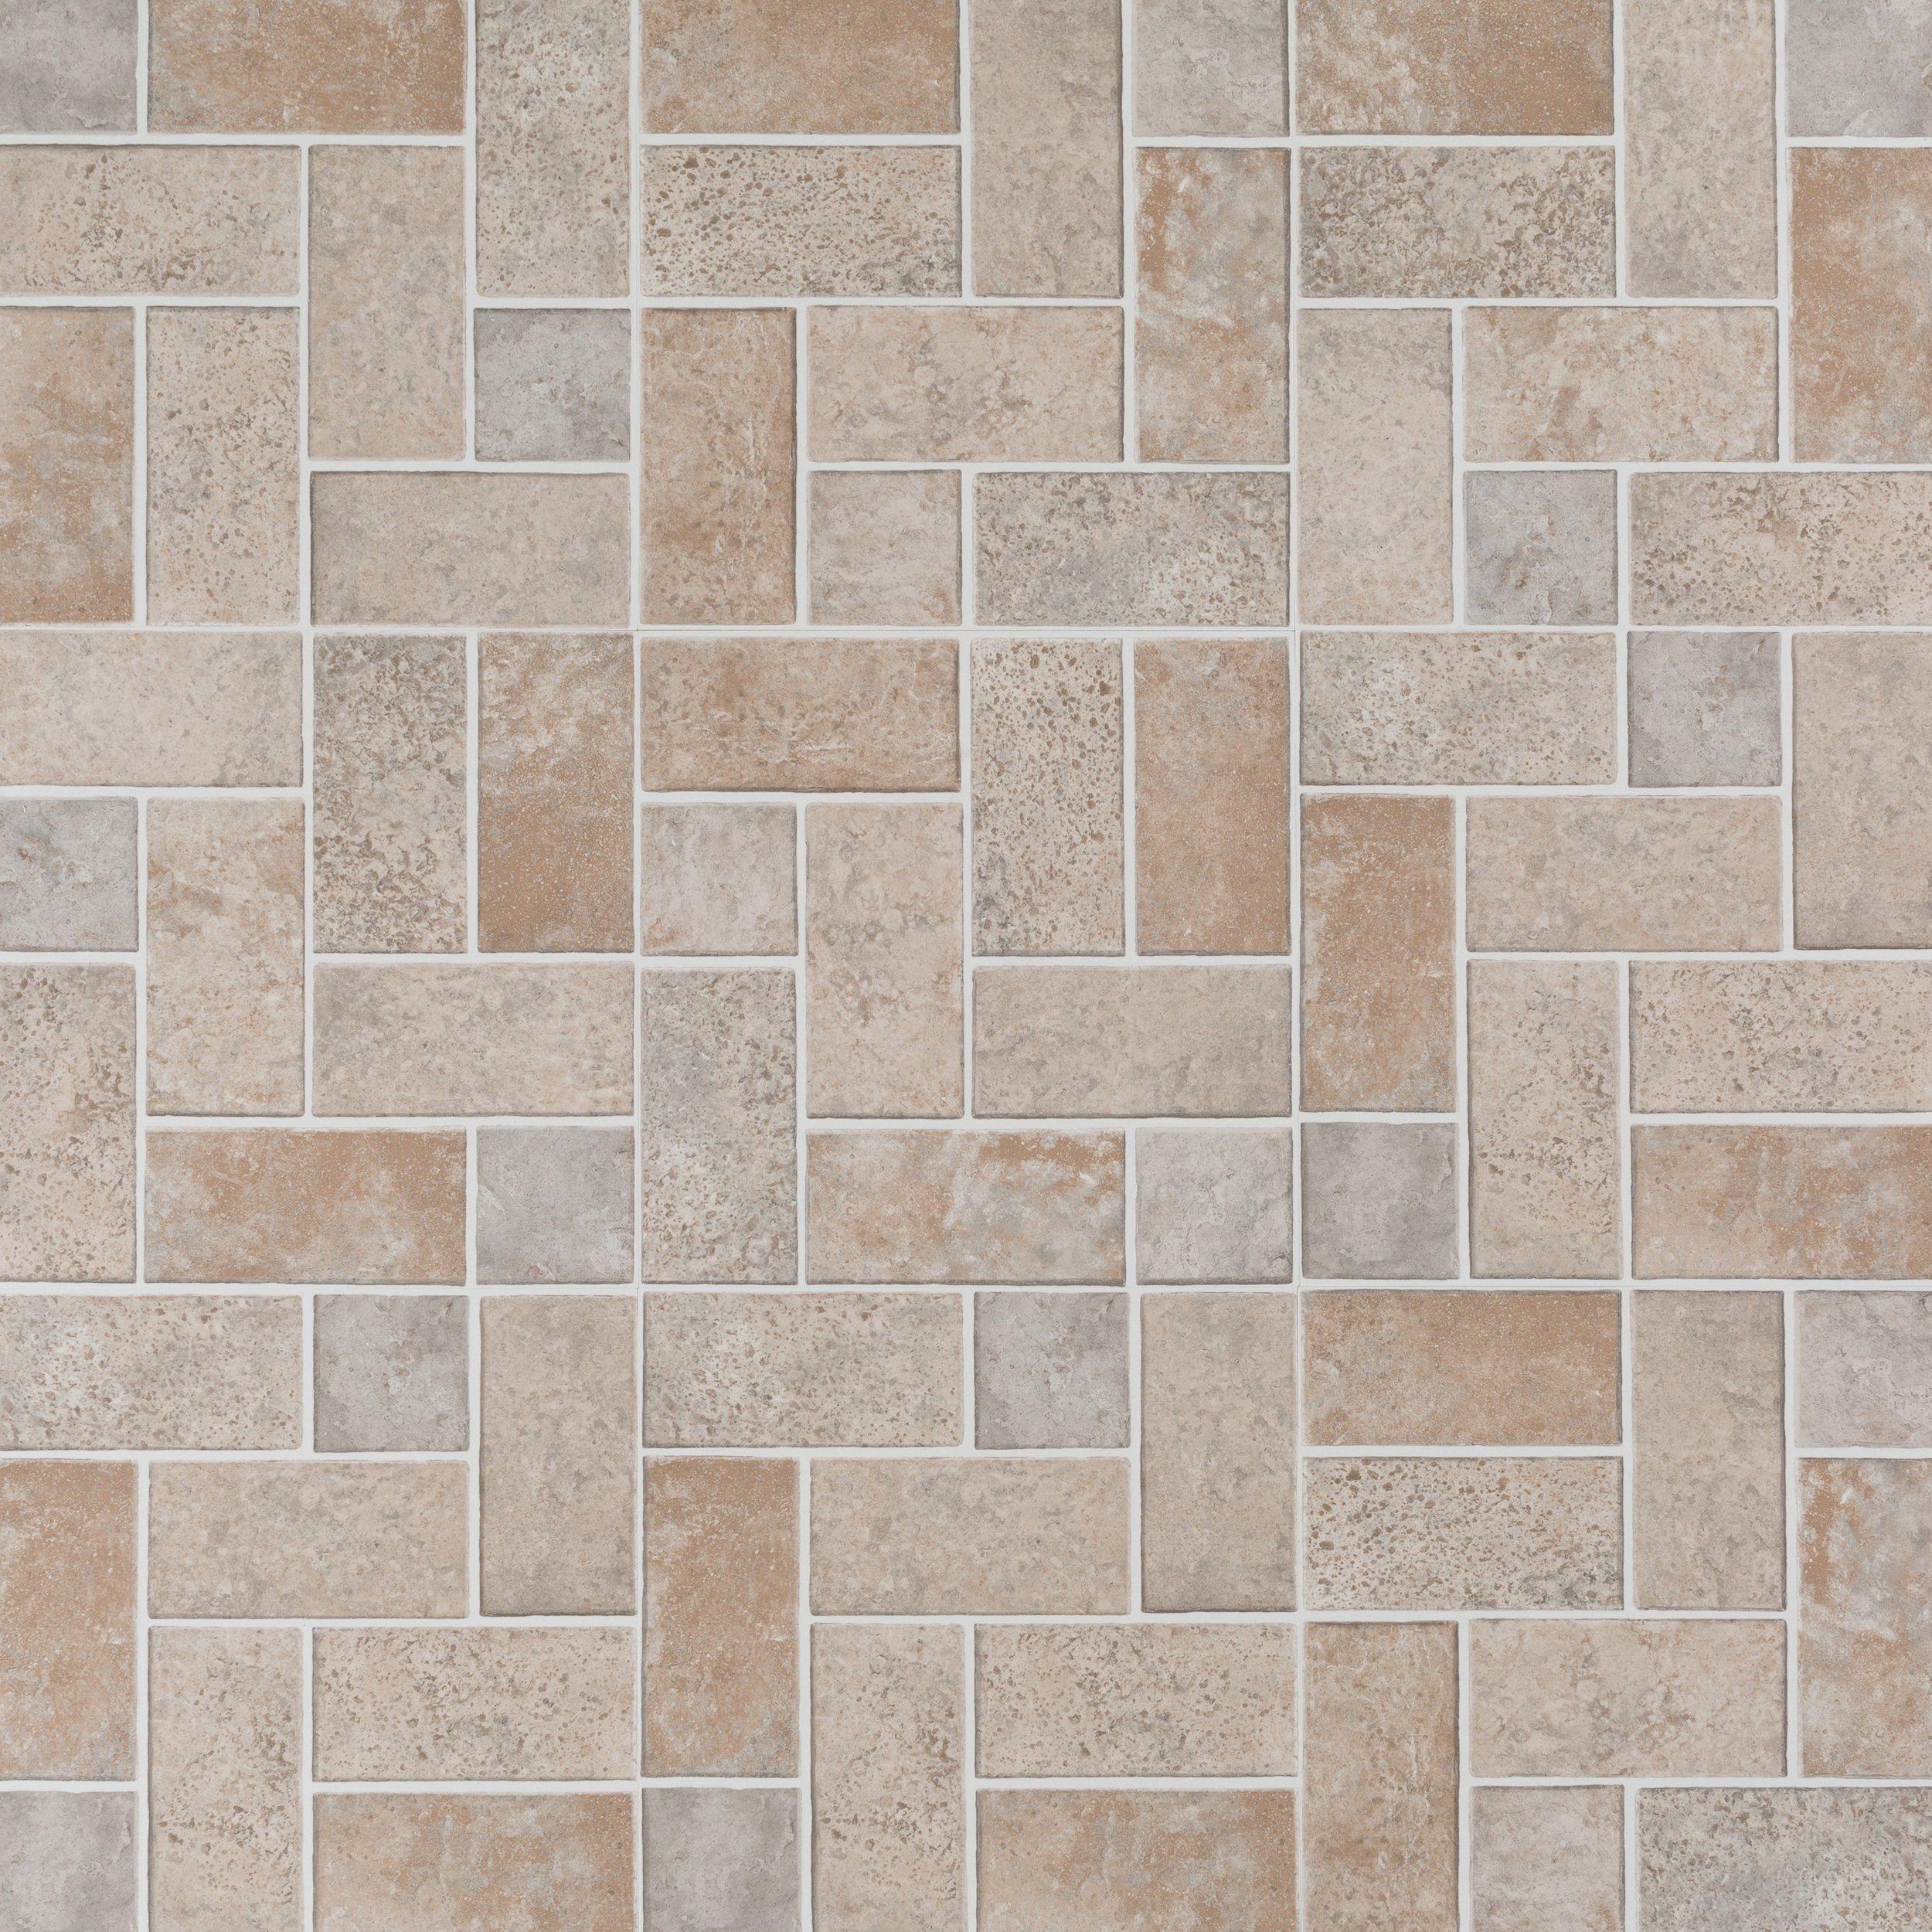 Brick Modular Gray Vinyl Tile